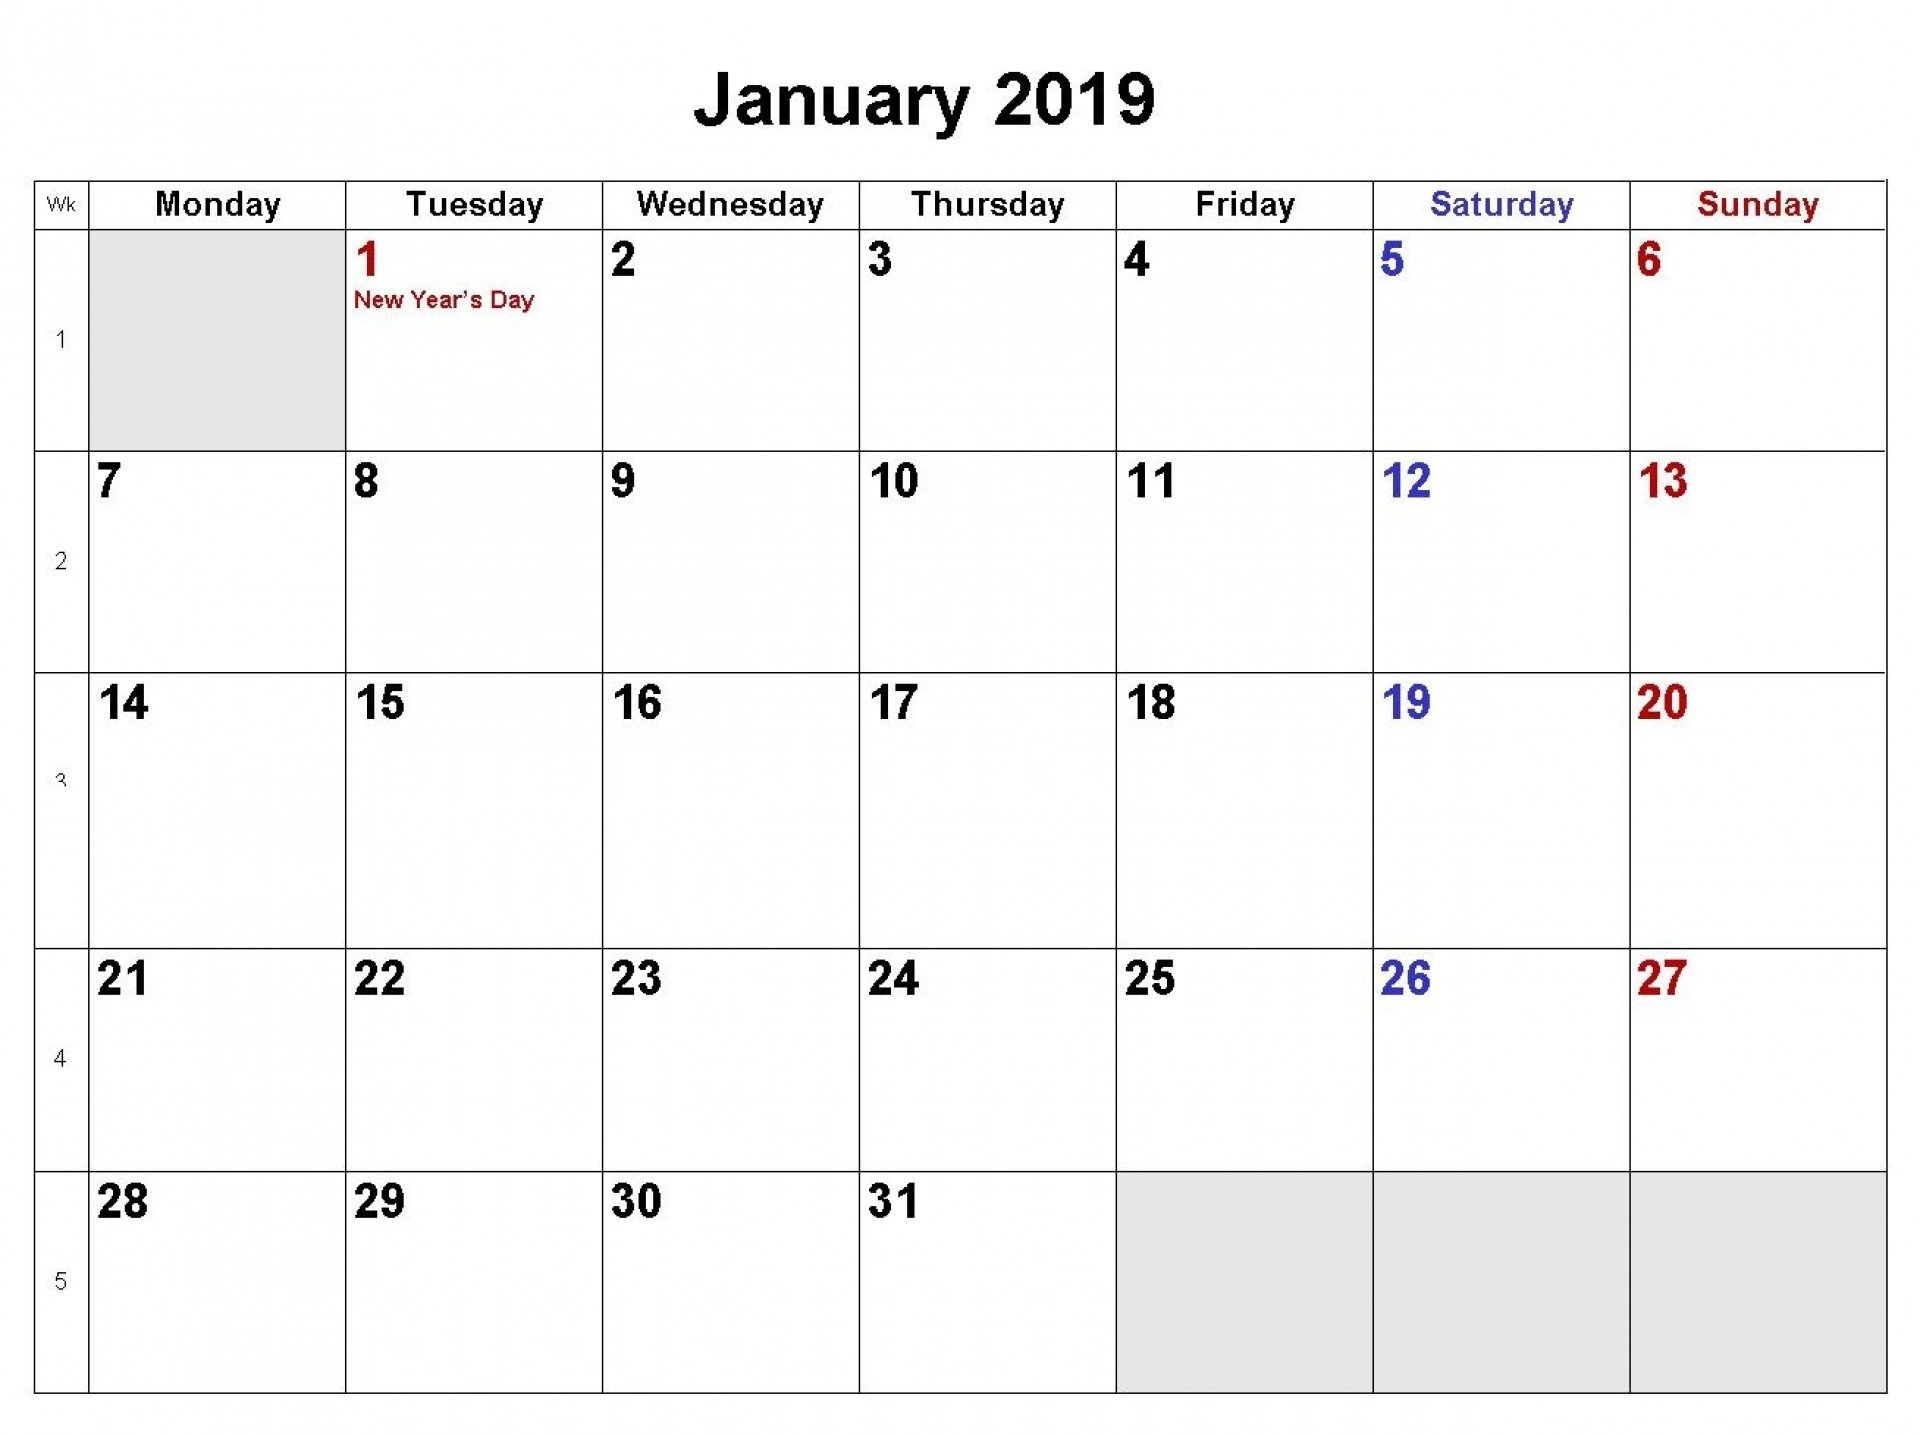 007 Template Ideas Free Calendar ~ Ulyssesroom 007 Calendar 2019